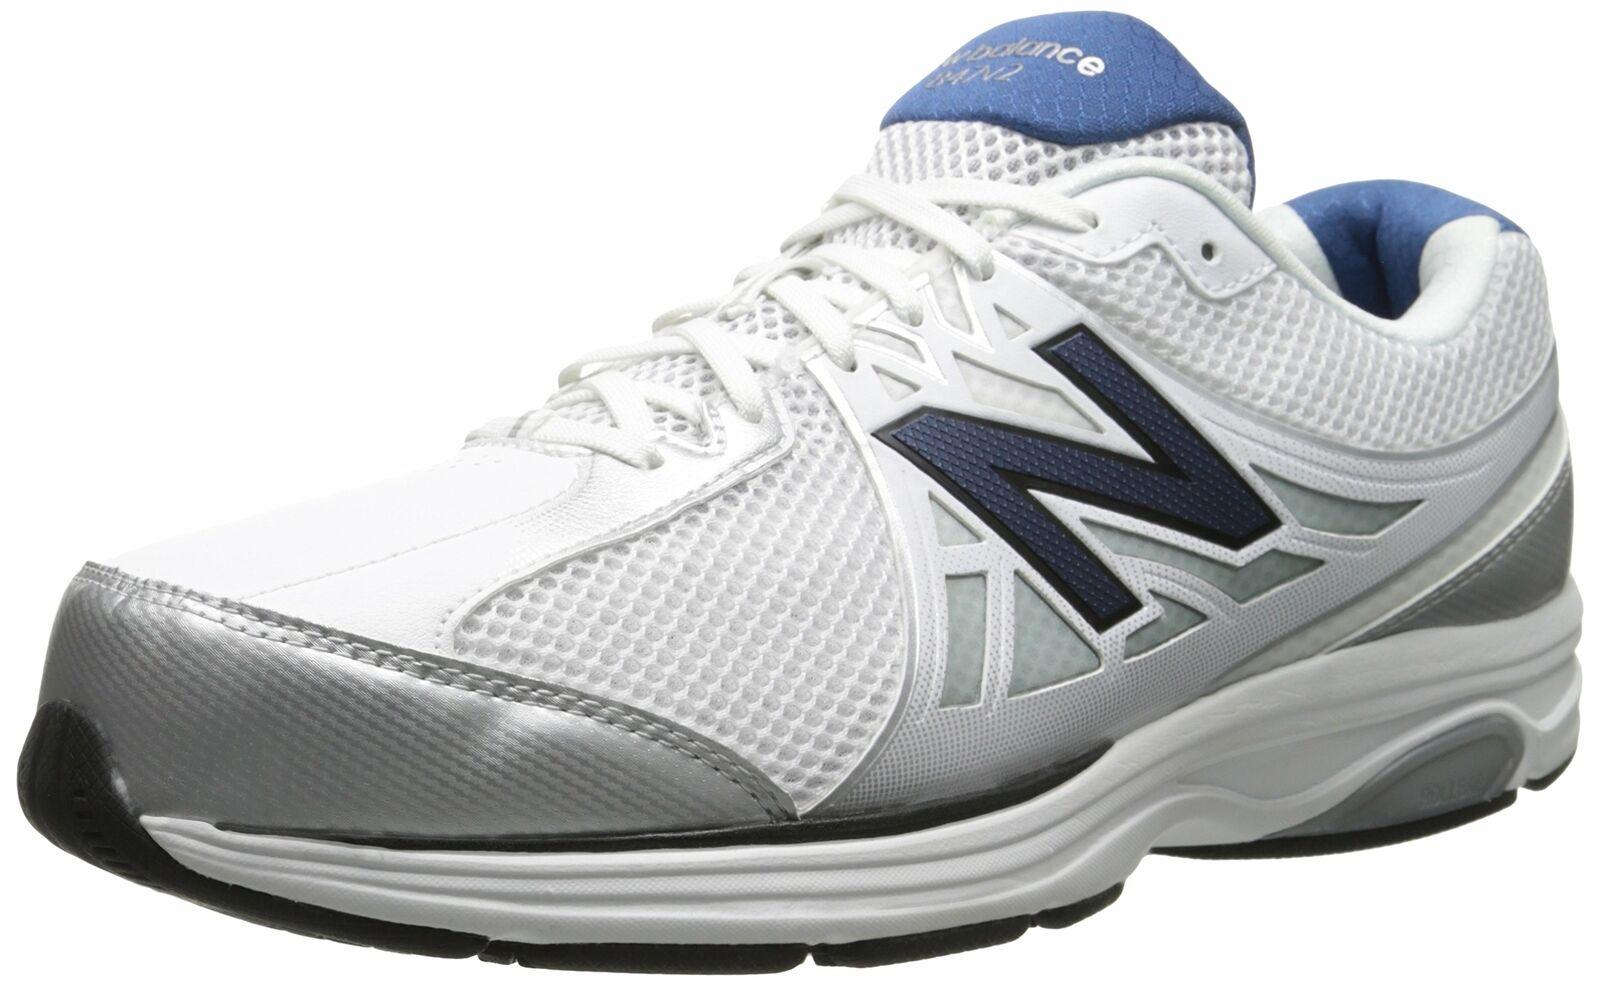 2070fd56f New Balance Men s MW847V2 shoes Navy 9 D US White Walking nwkili8266 ...